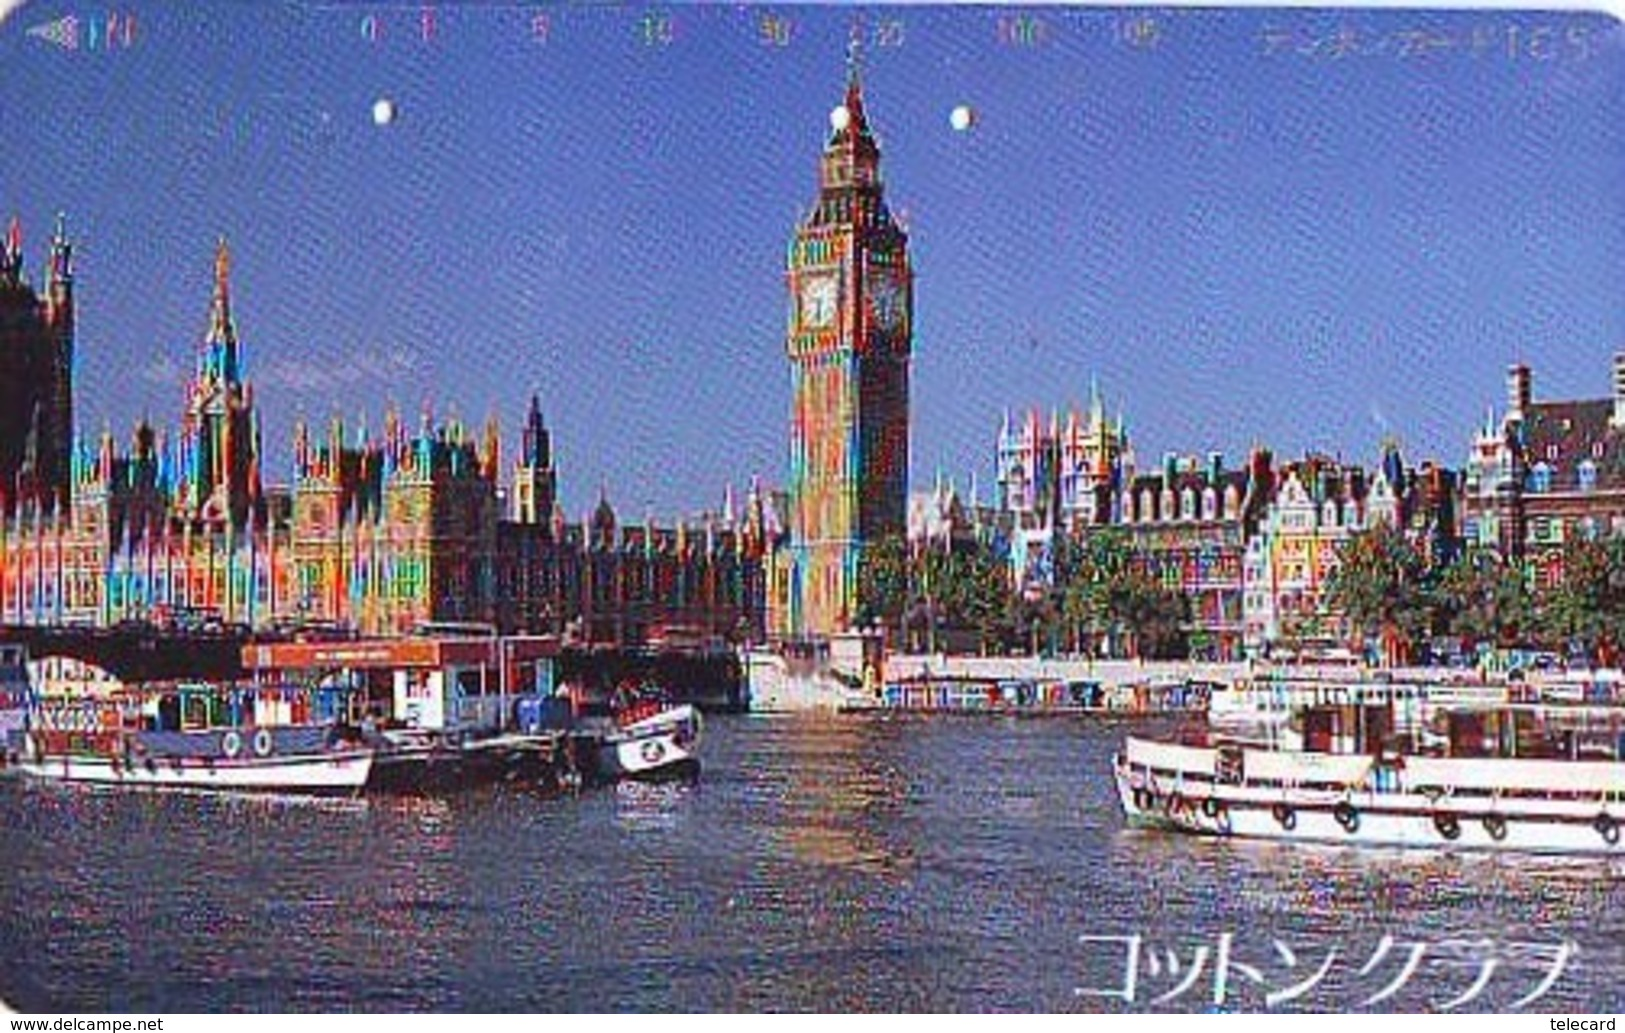 Télécarte Japon ANGLETERRE * BIG BEN  (310) GREAT BRITAIN Related * ENGLAND Phonecard Japan * - Paisajes